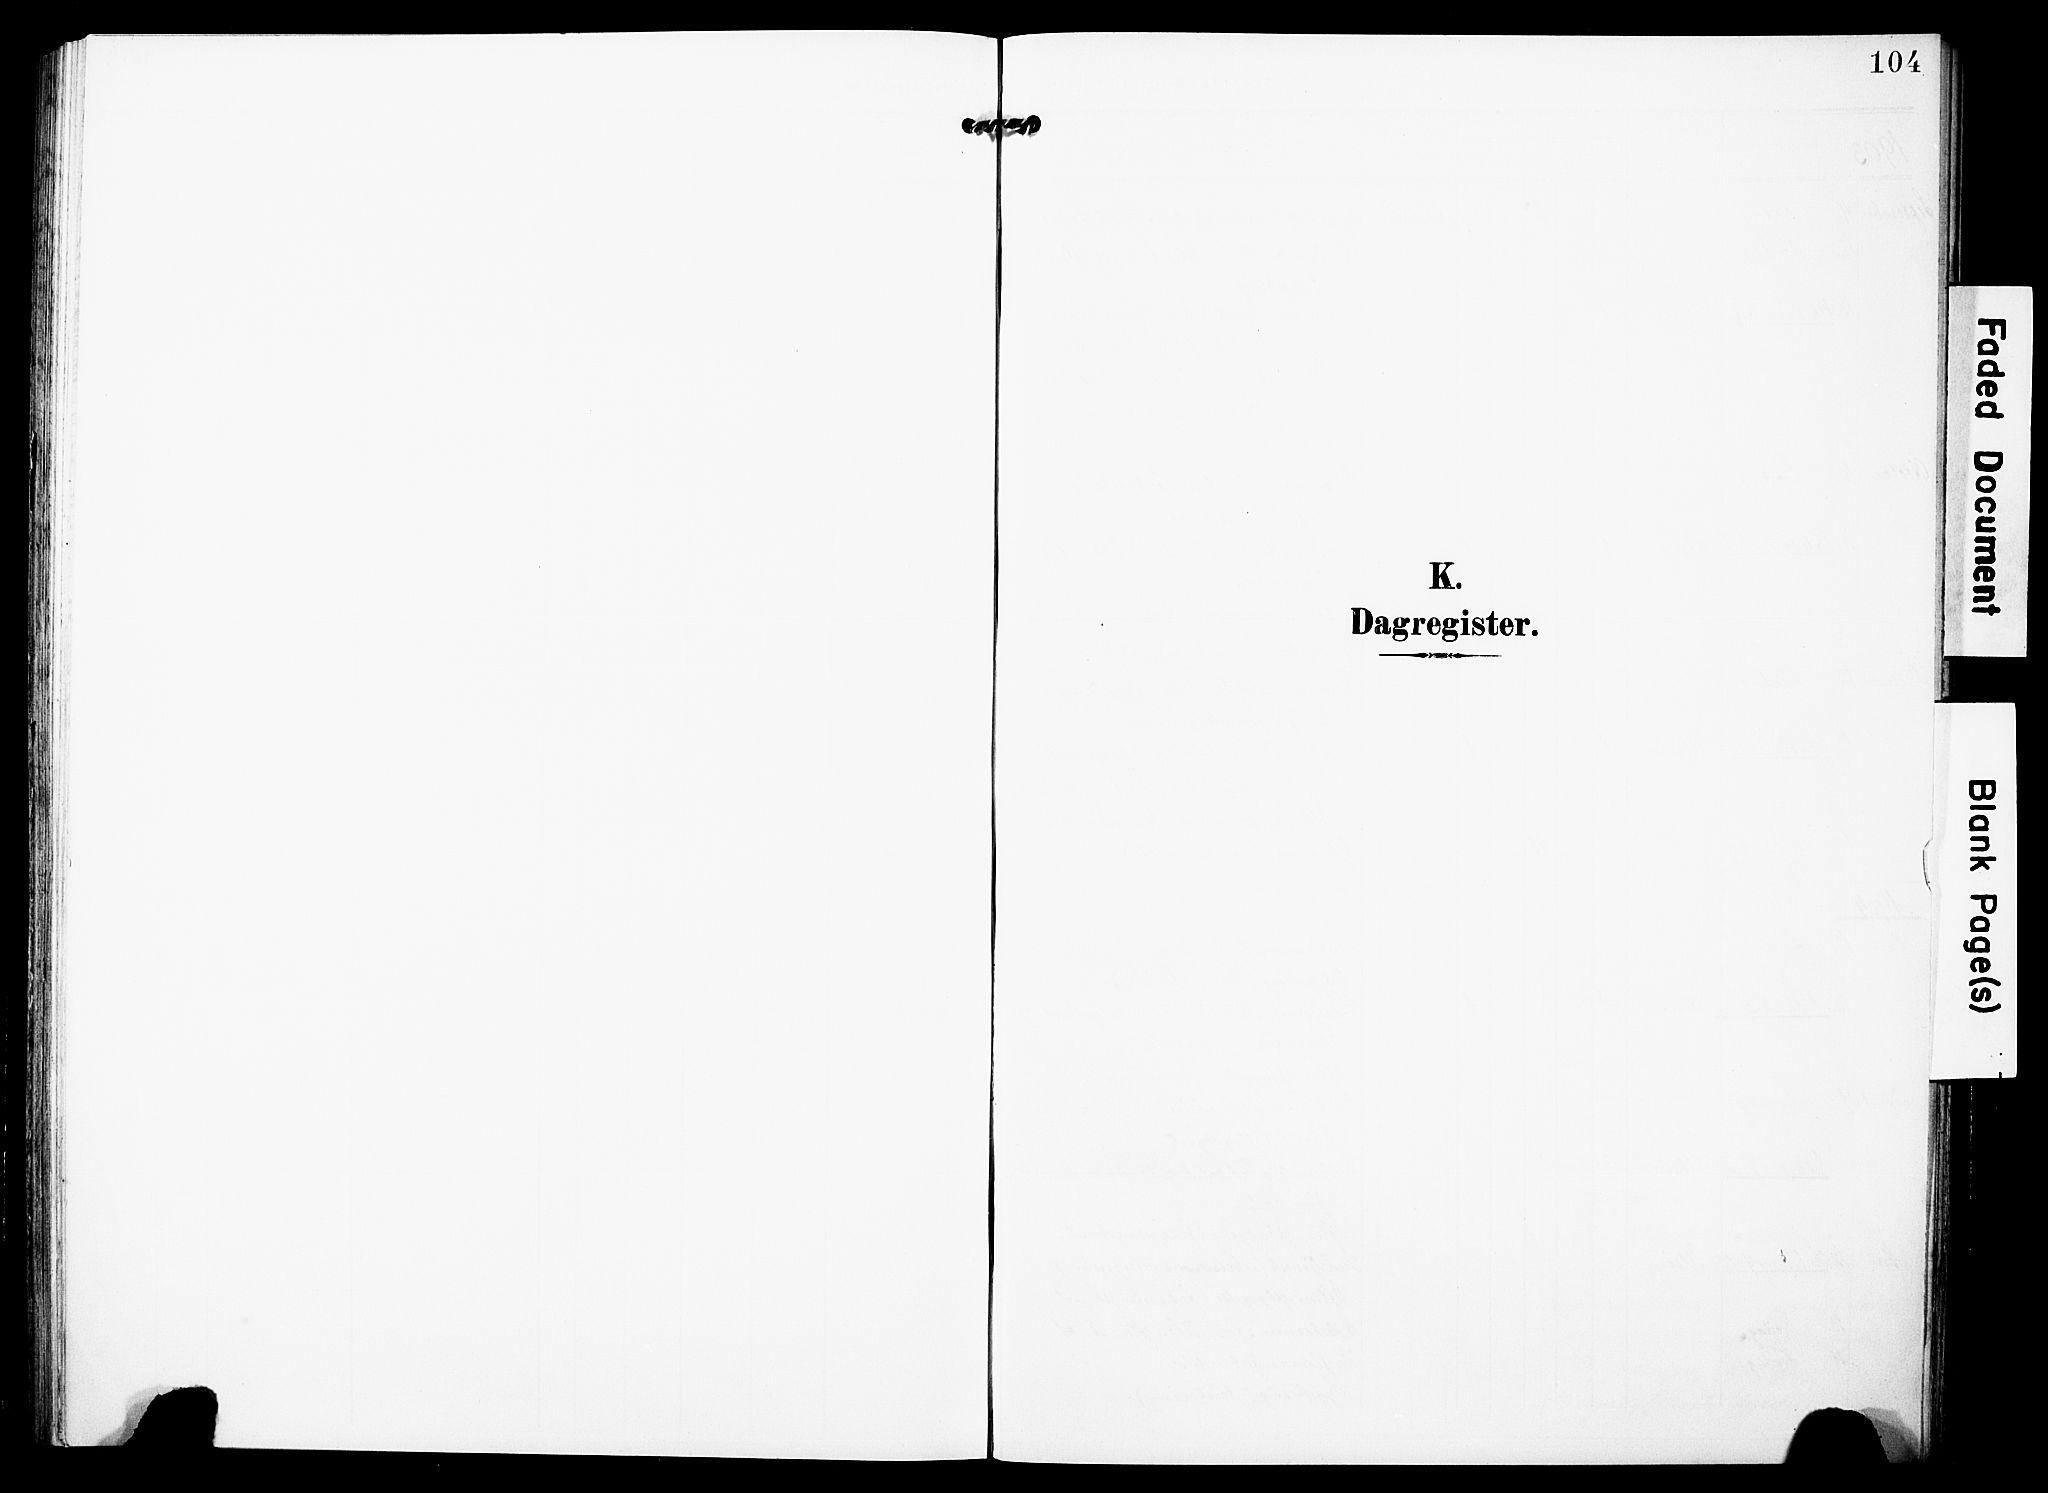 SAST, Torvastad sokneprestkontor, H/Ha/Haa/L0018: Ministerialbok nr. A 17, 1903-1925, s. 104